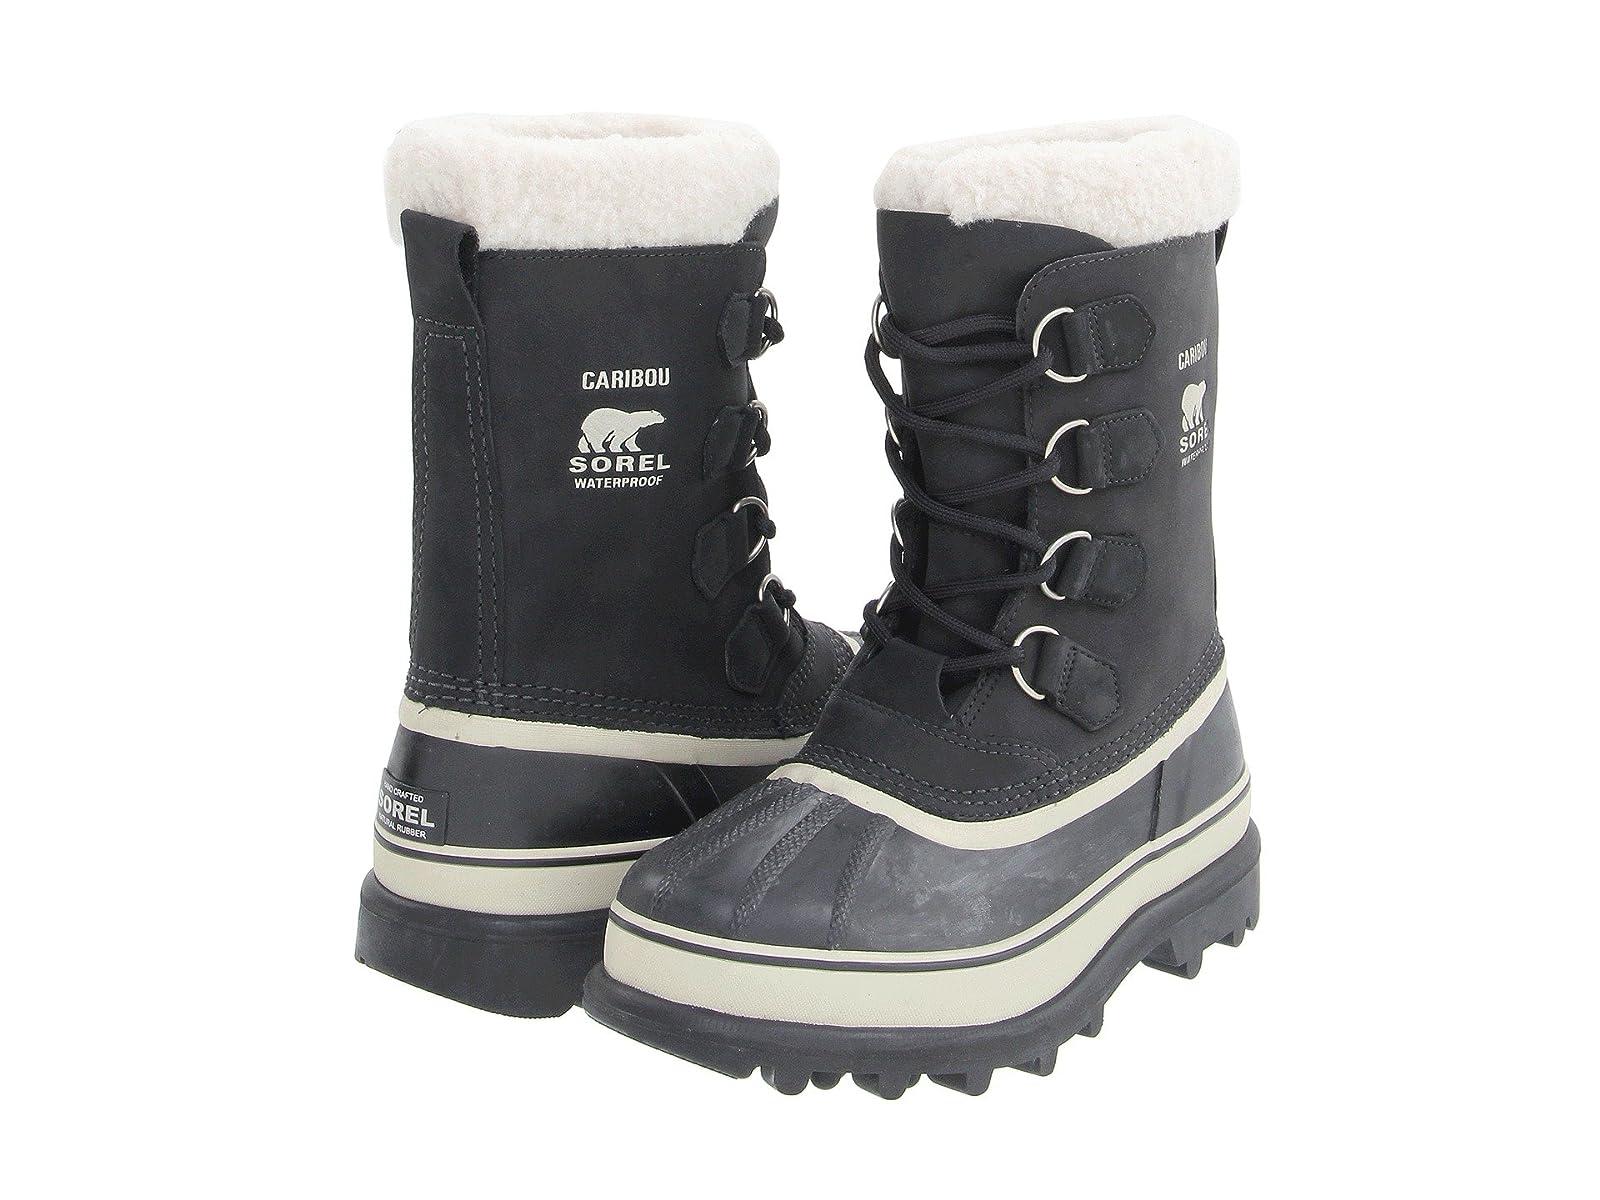 SOREL Caribou™Economical and quality shoes